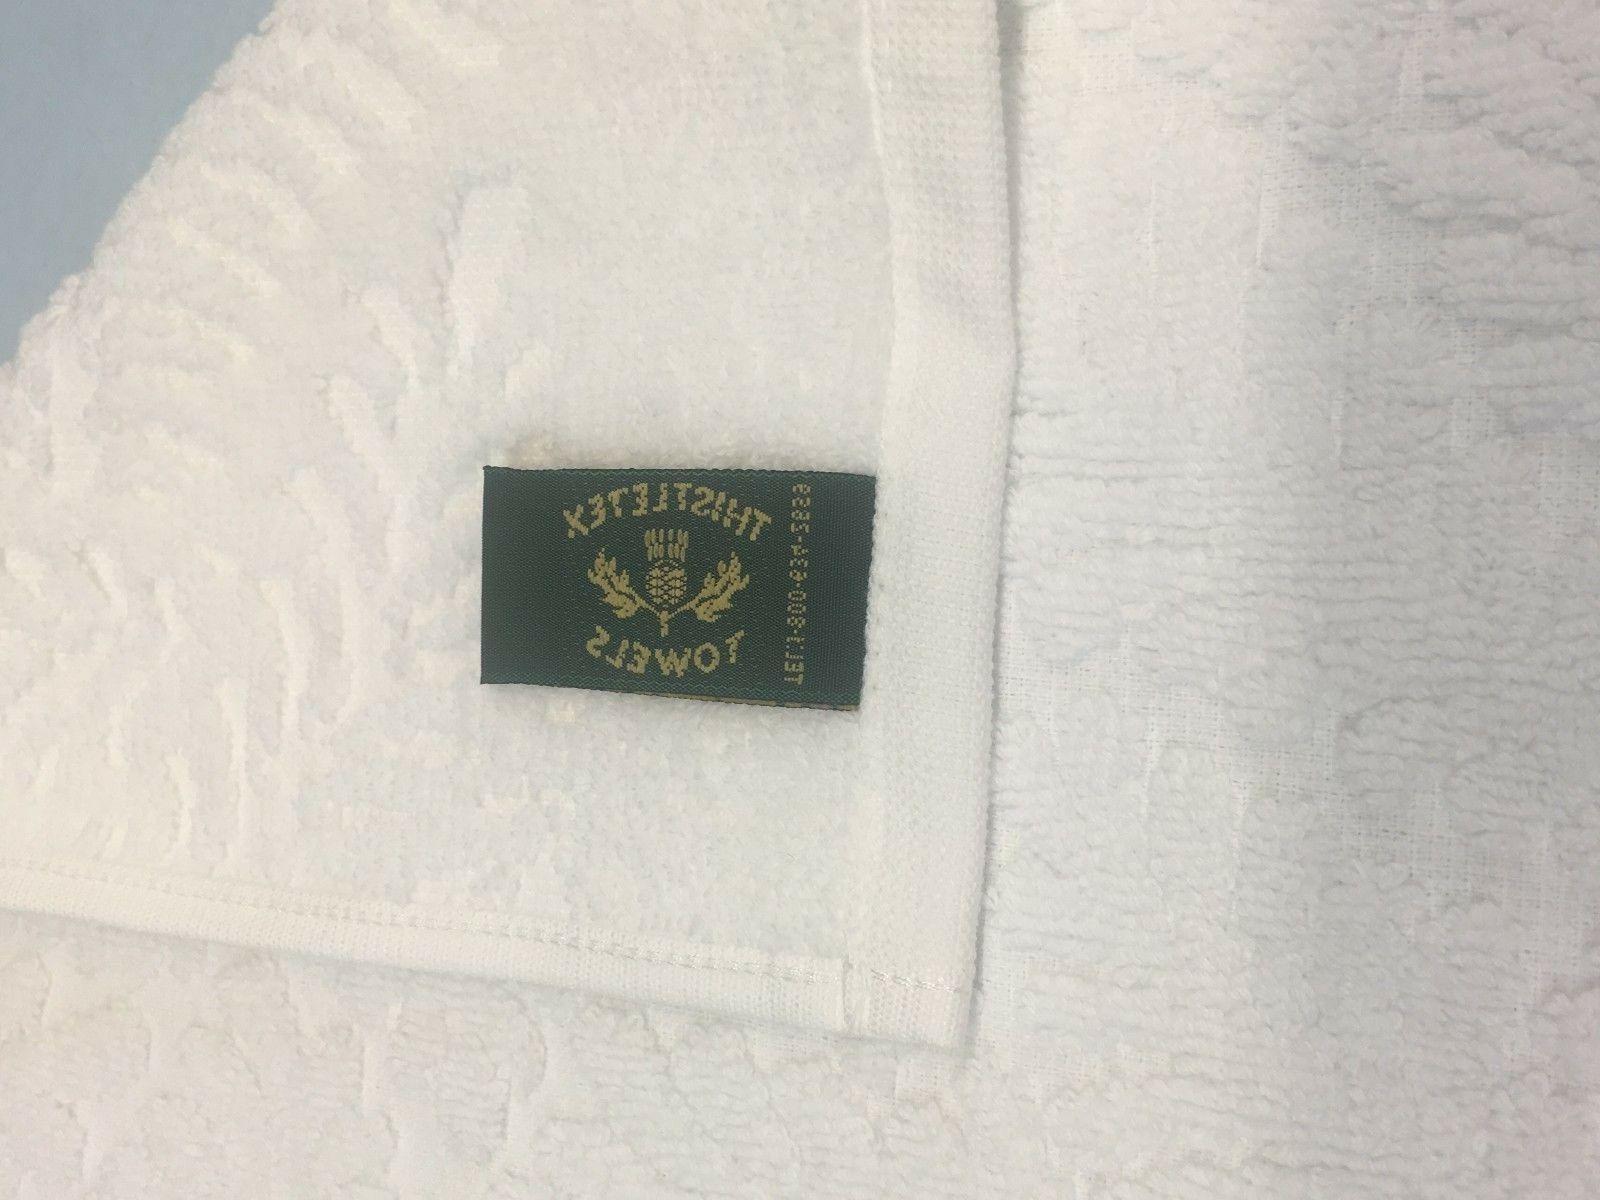 Thistletex Cotton, Portugal plus